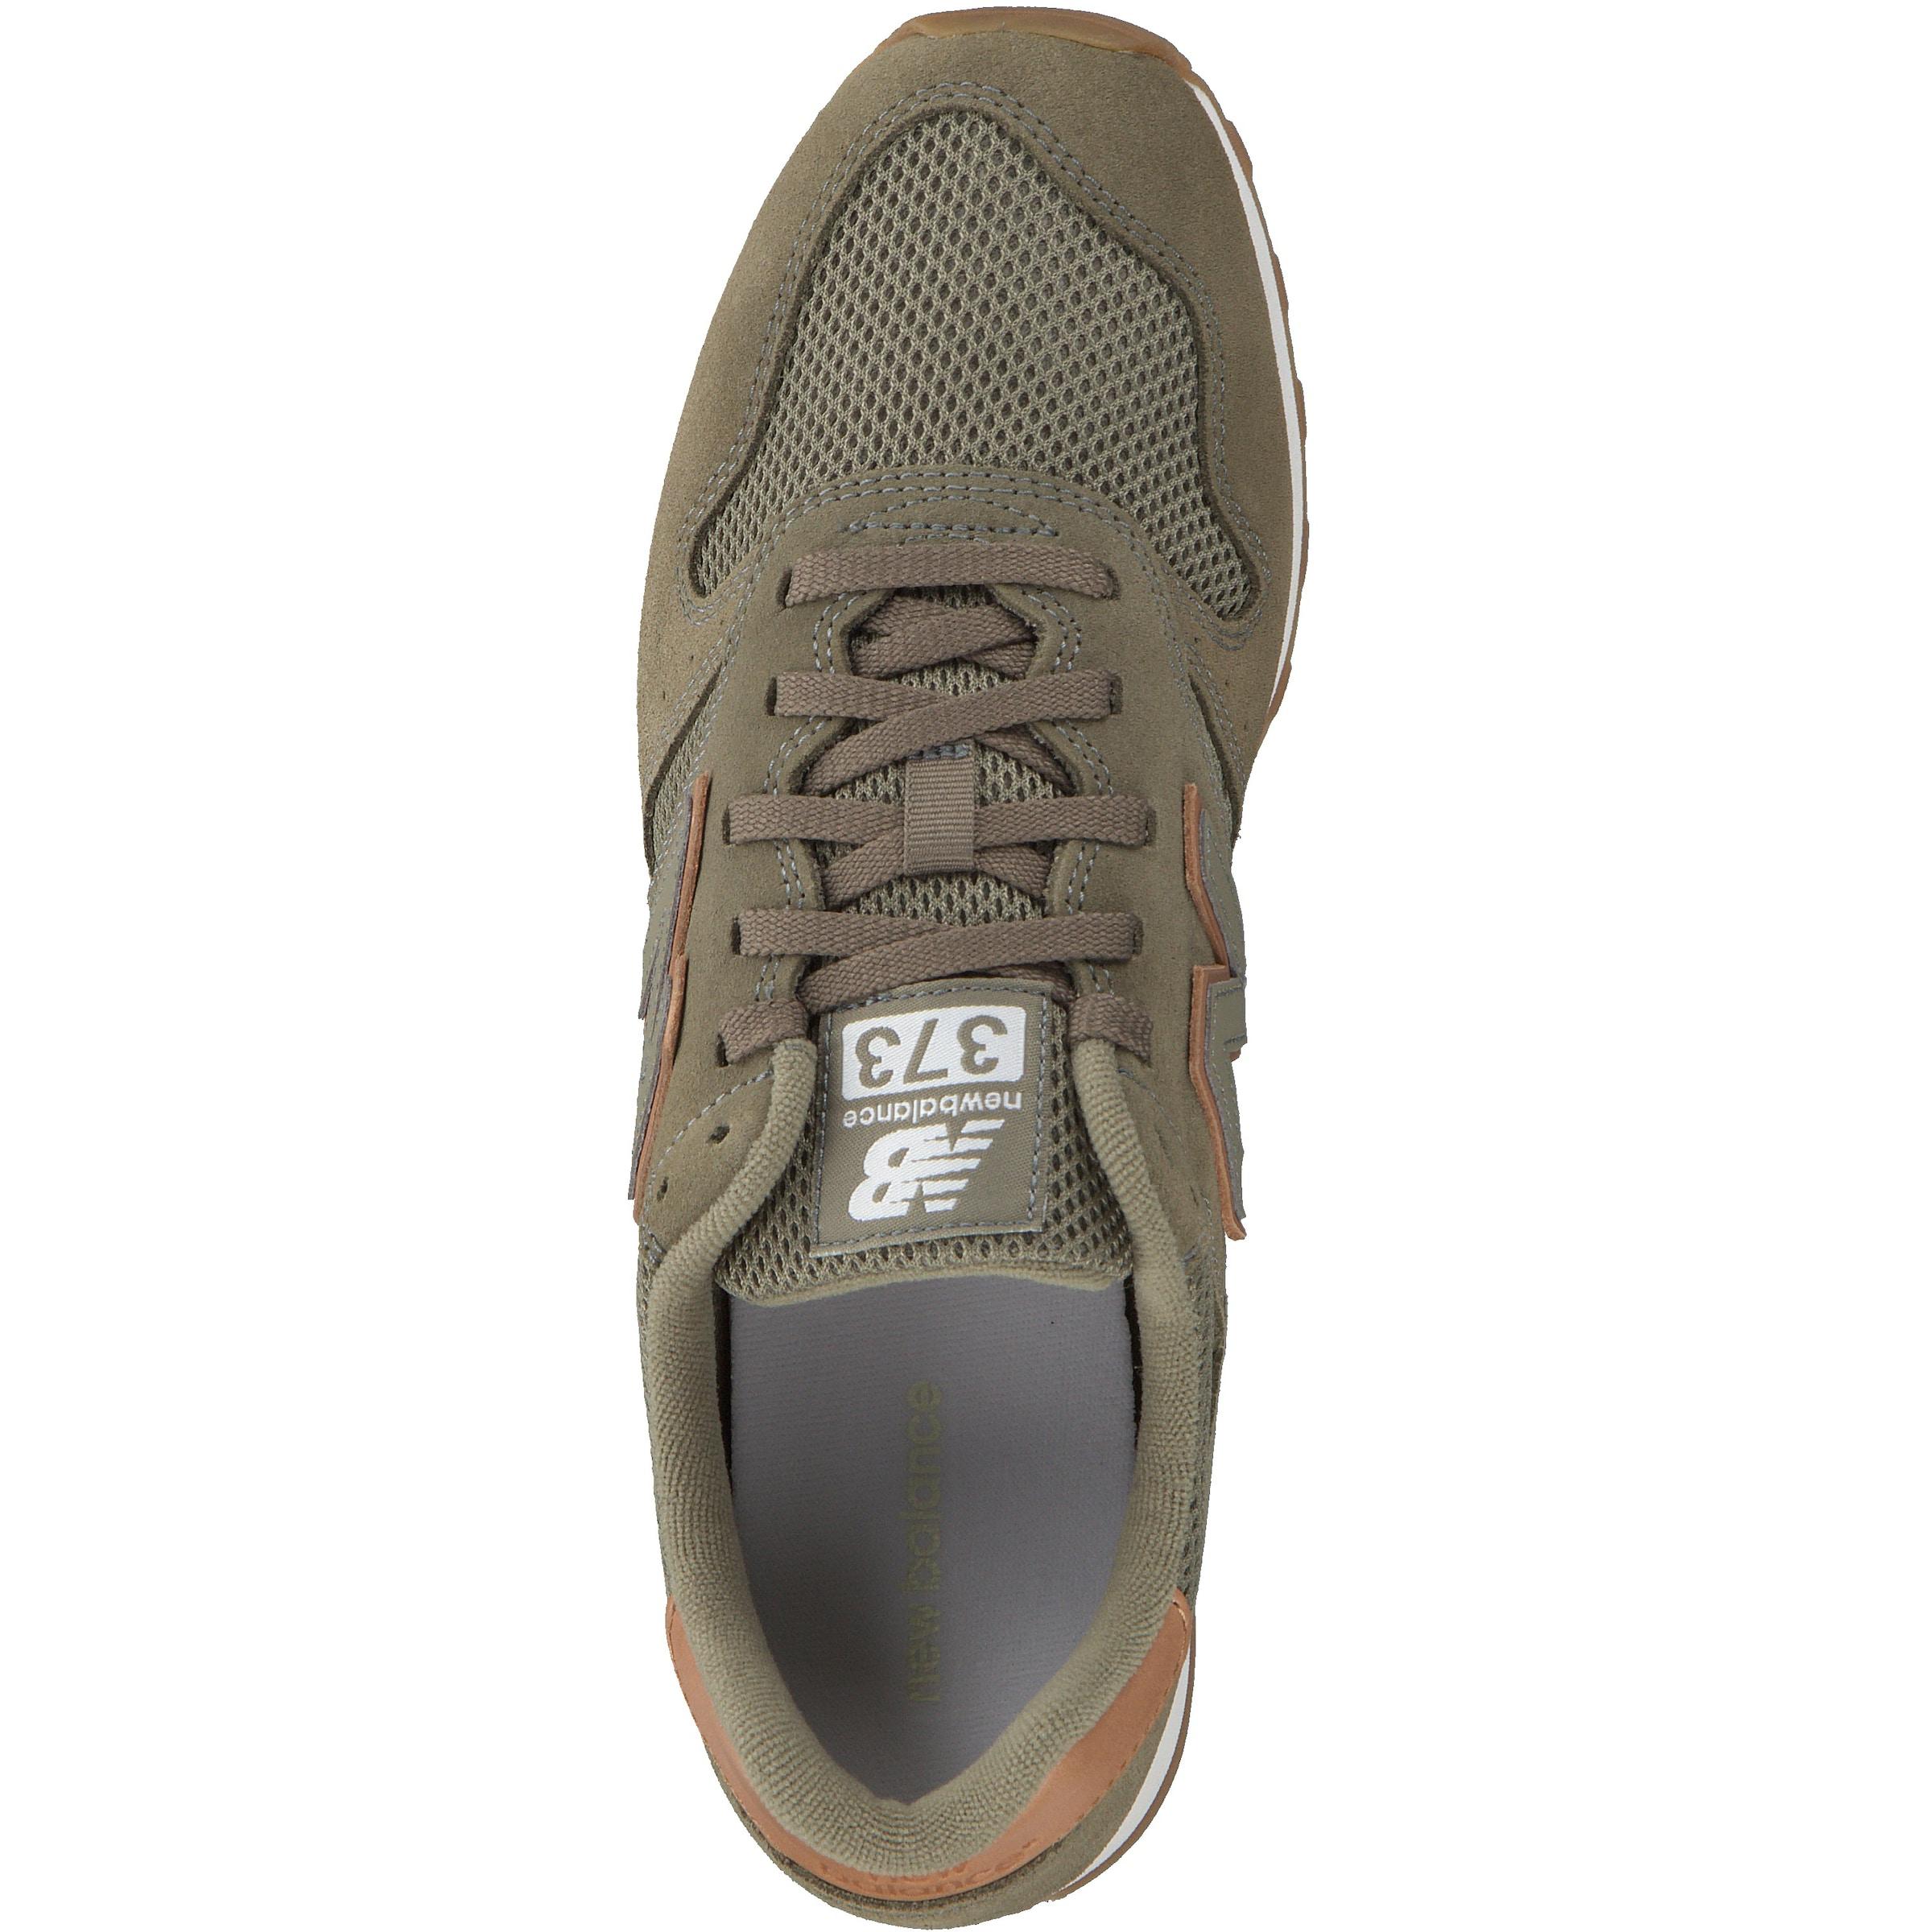 Sneaker New Weiß In BraunKhaki Balance jqSc43ARL5